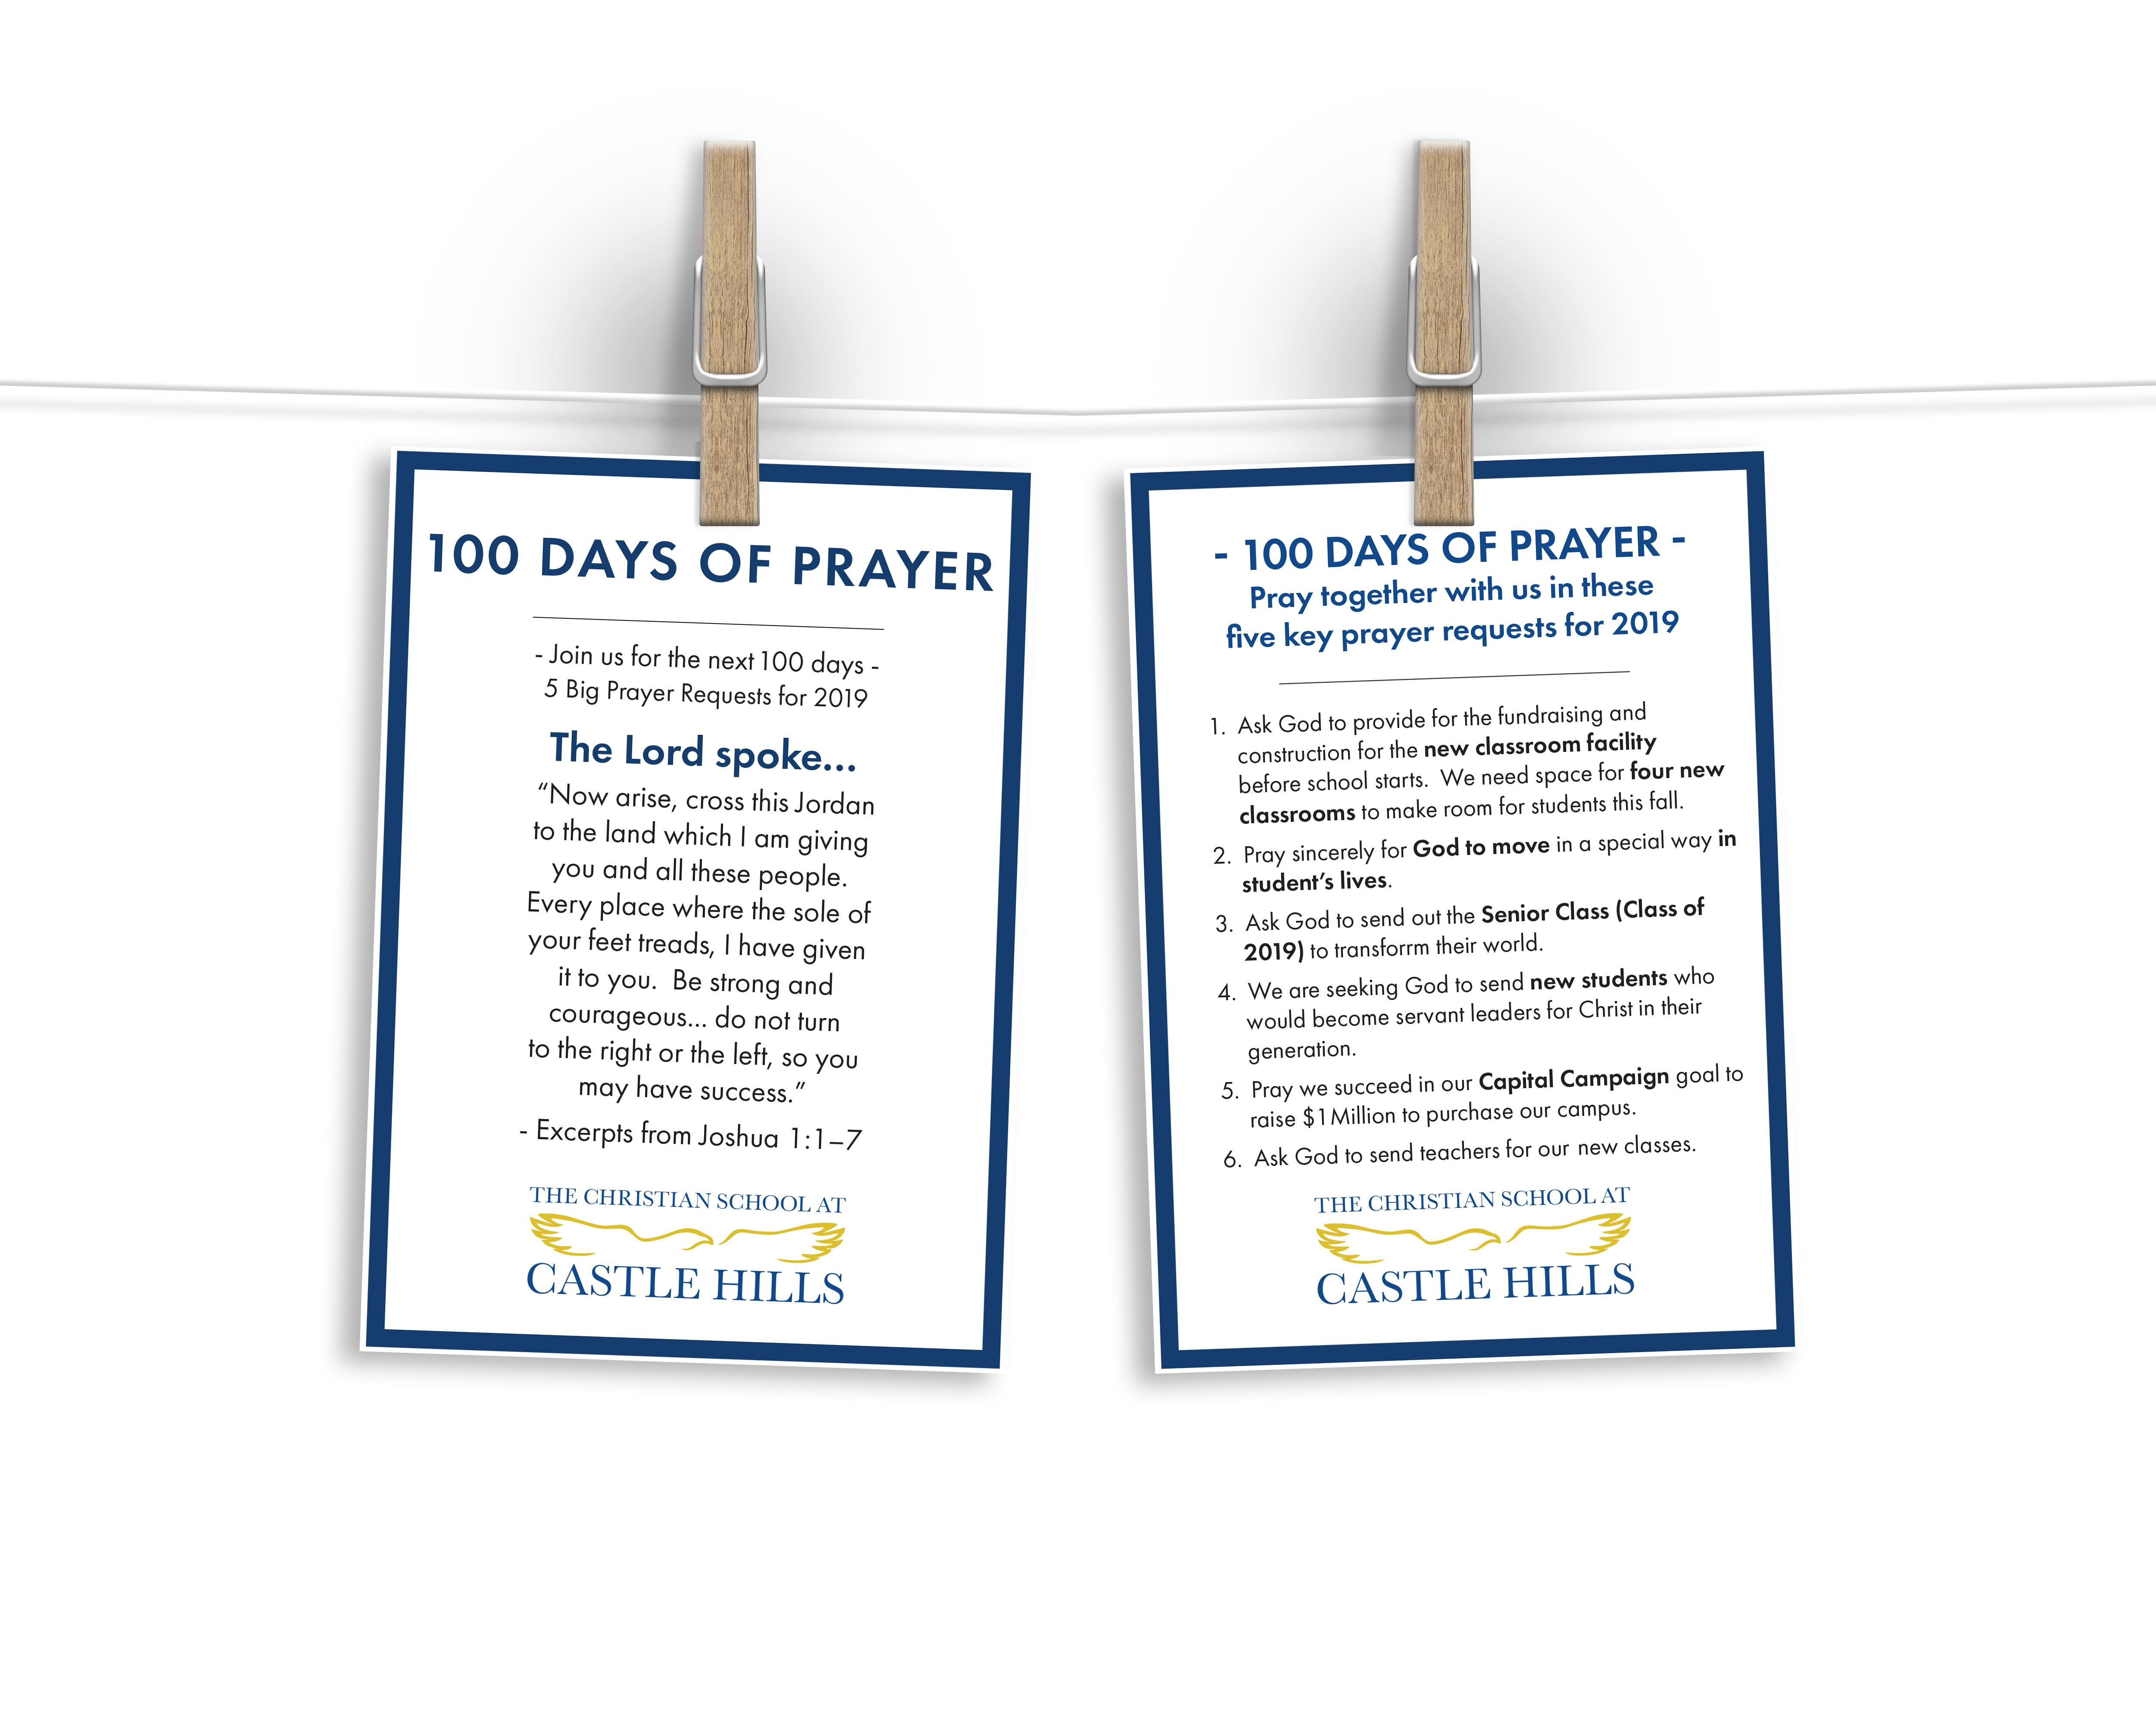 100 Days of Prayer MockUp | The Christian School at Castle Hills